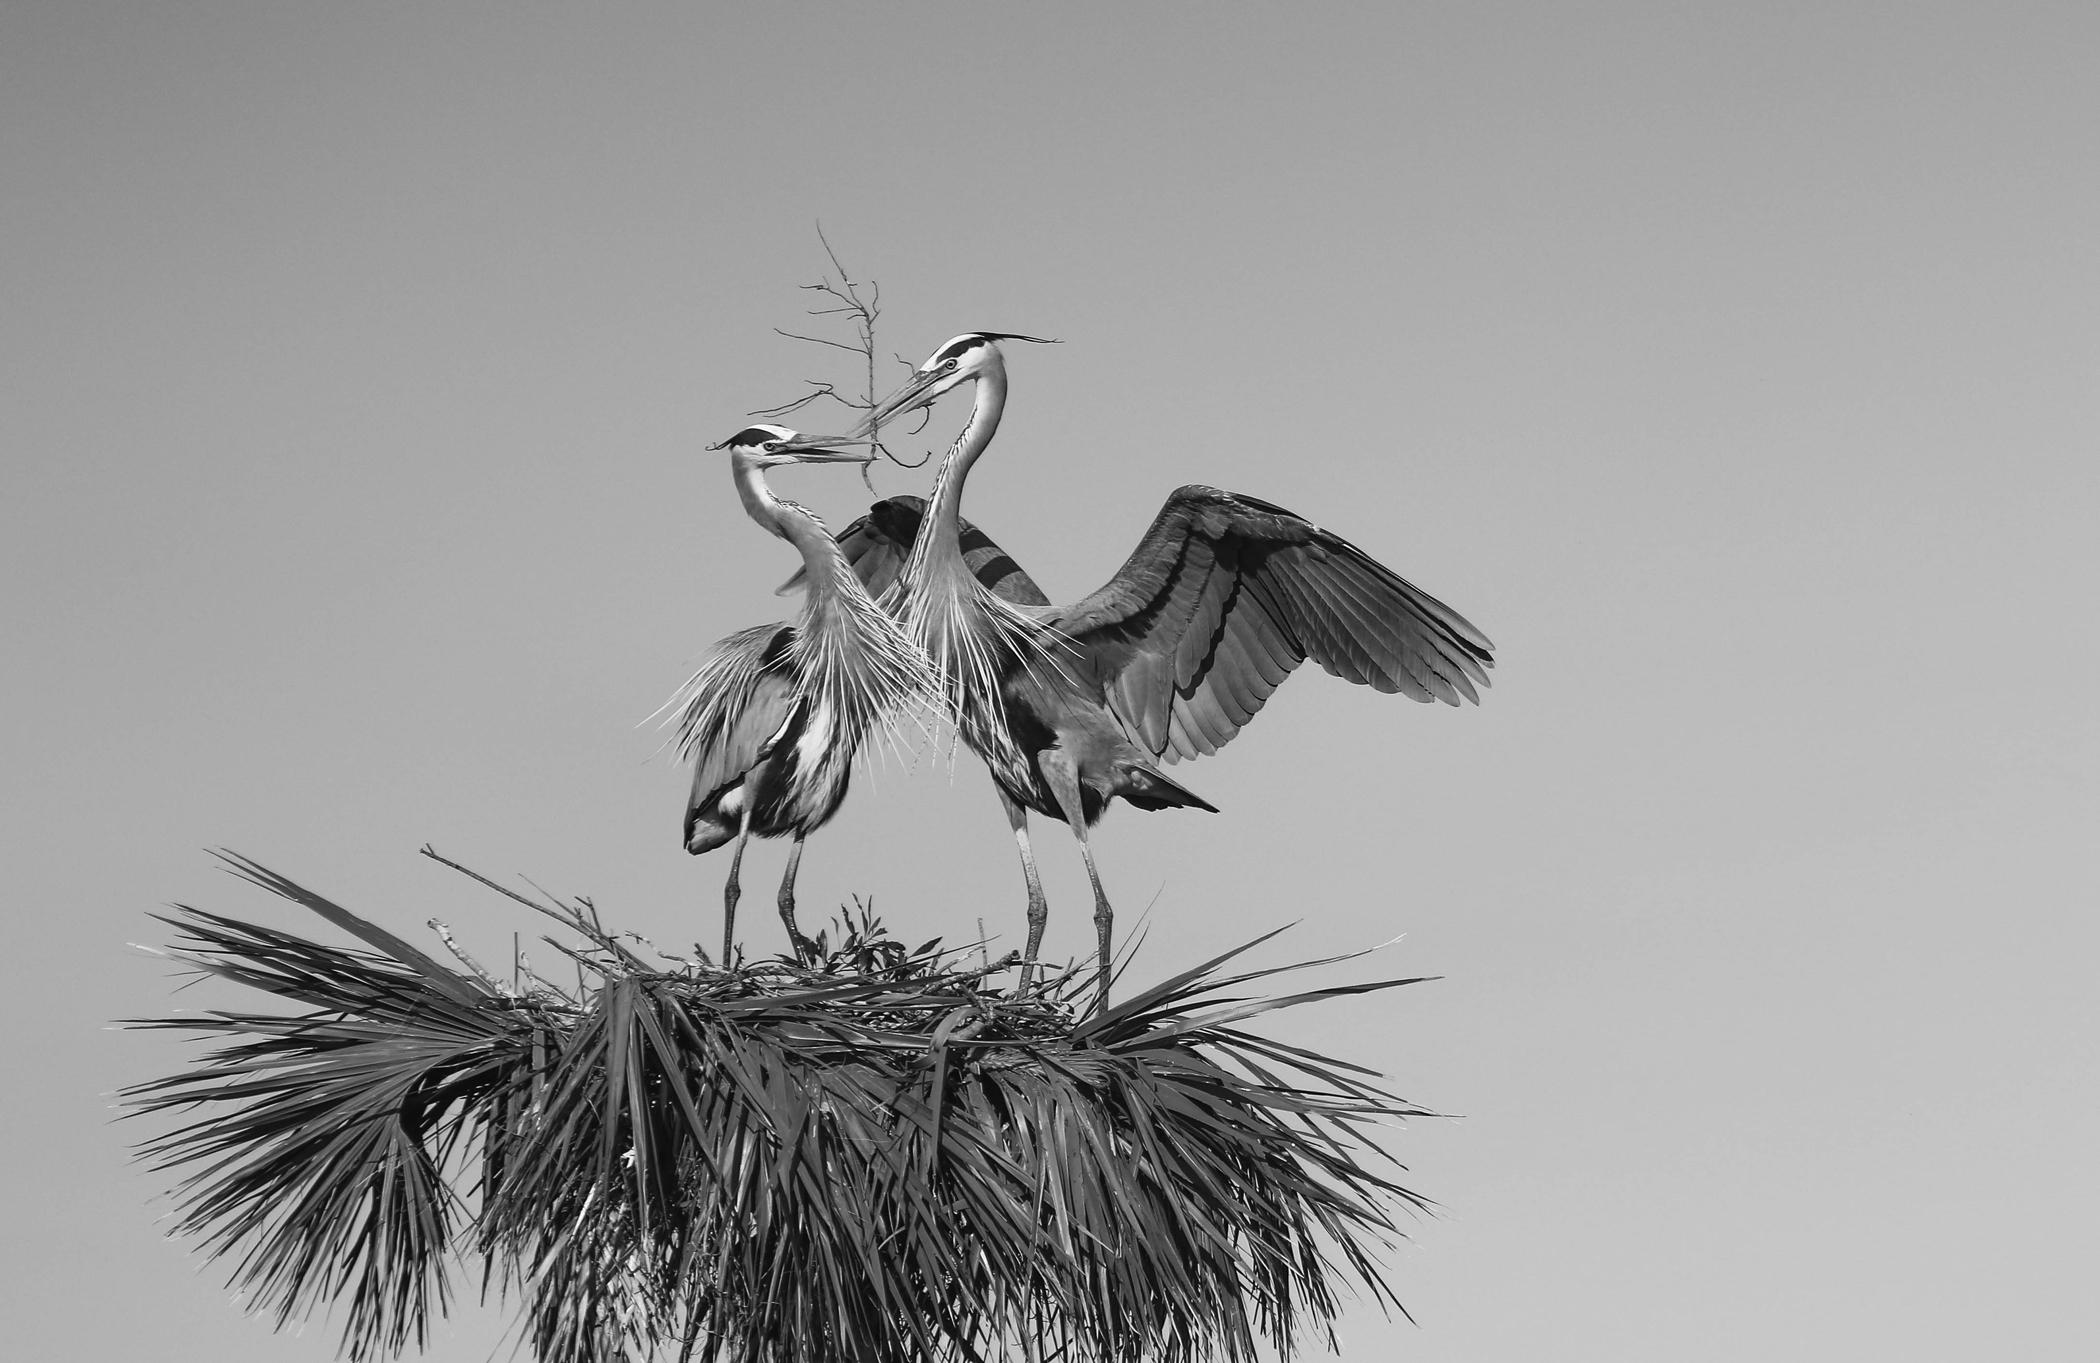 Nesting Blue Herons – Ken Bohlman – Menomonee Falls Camera Club